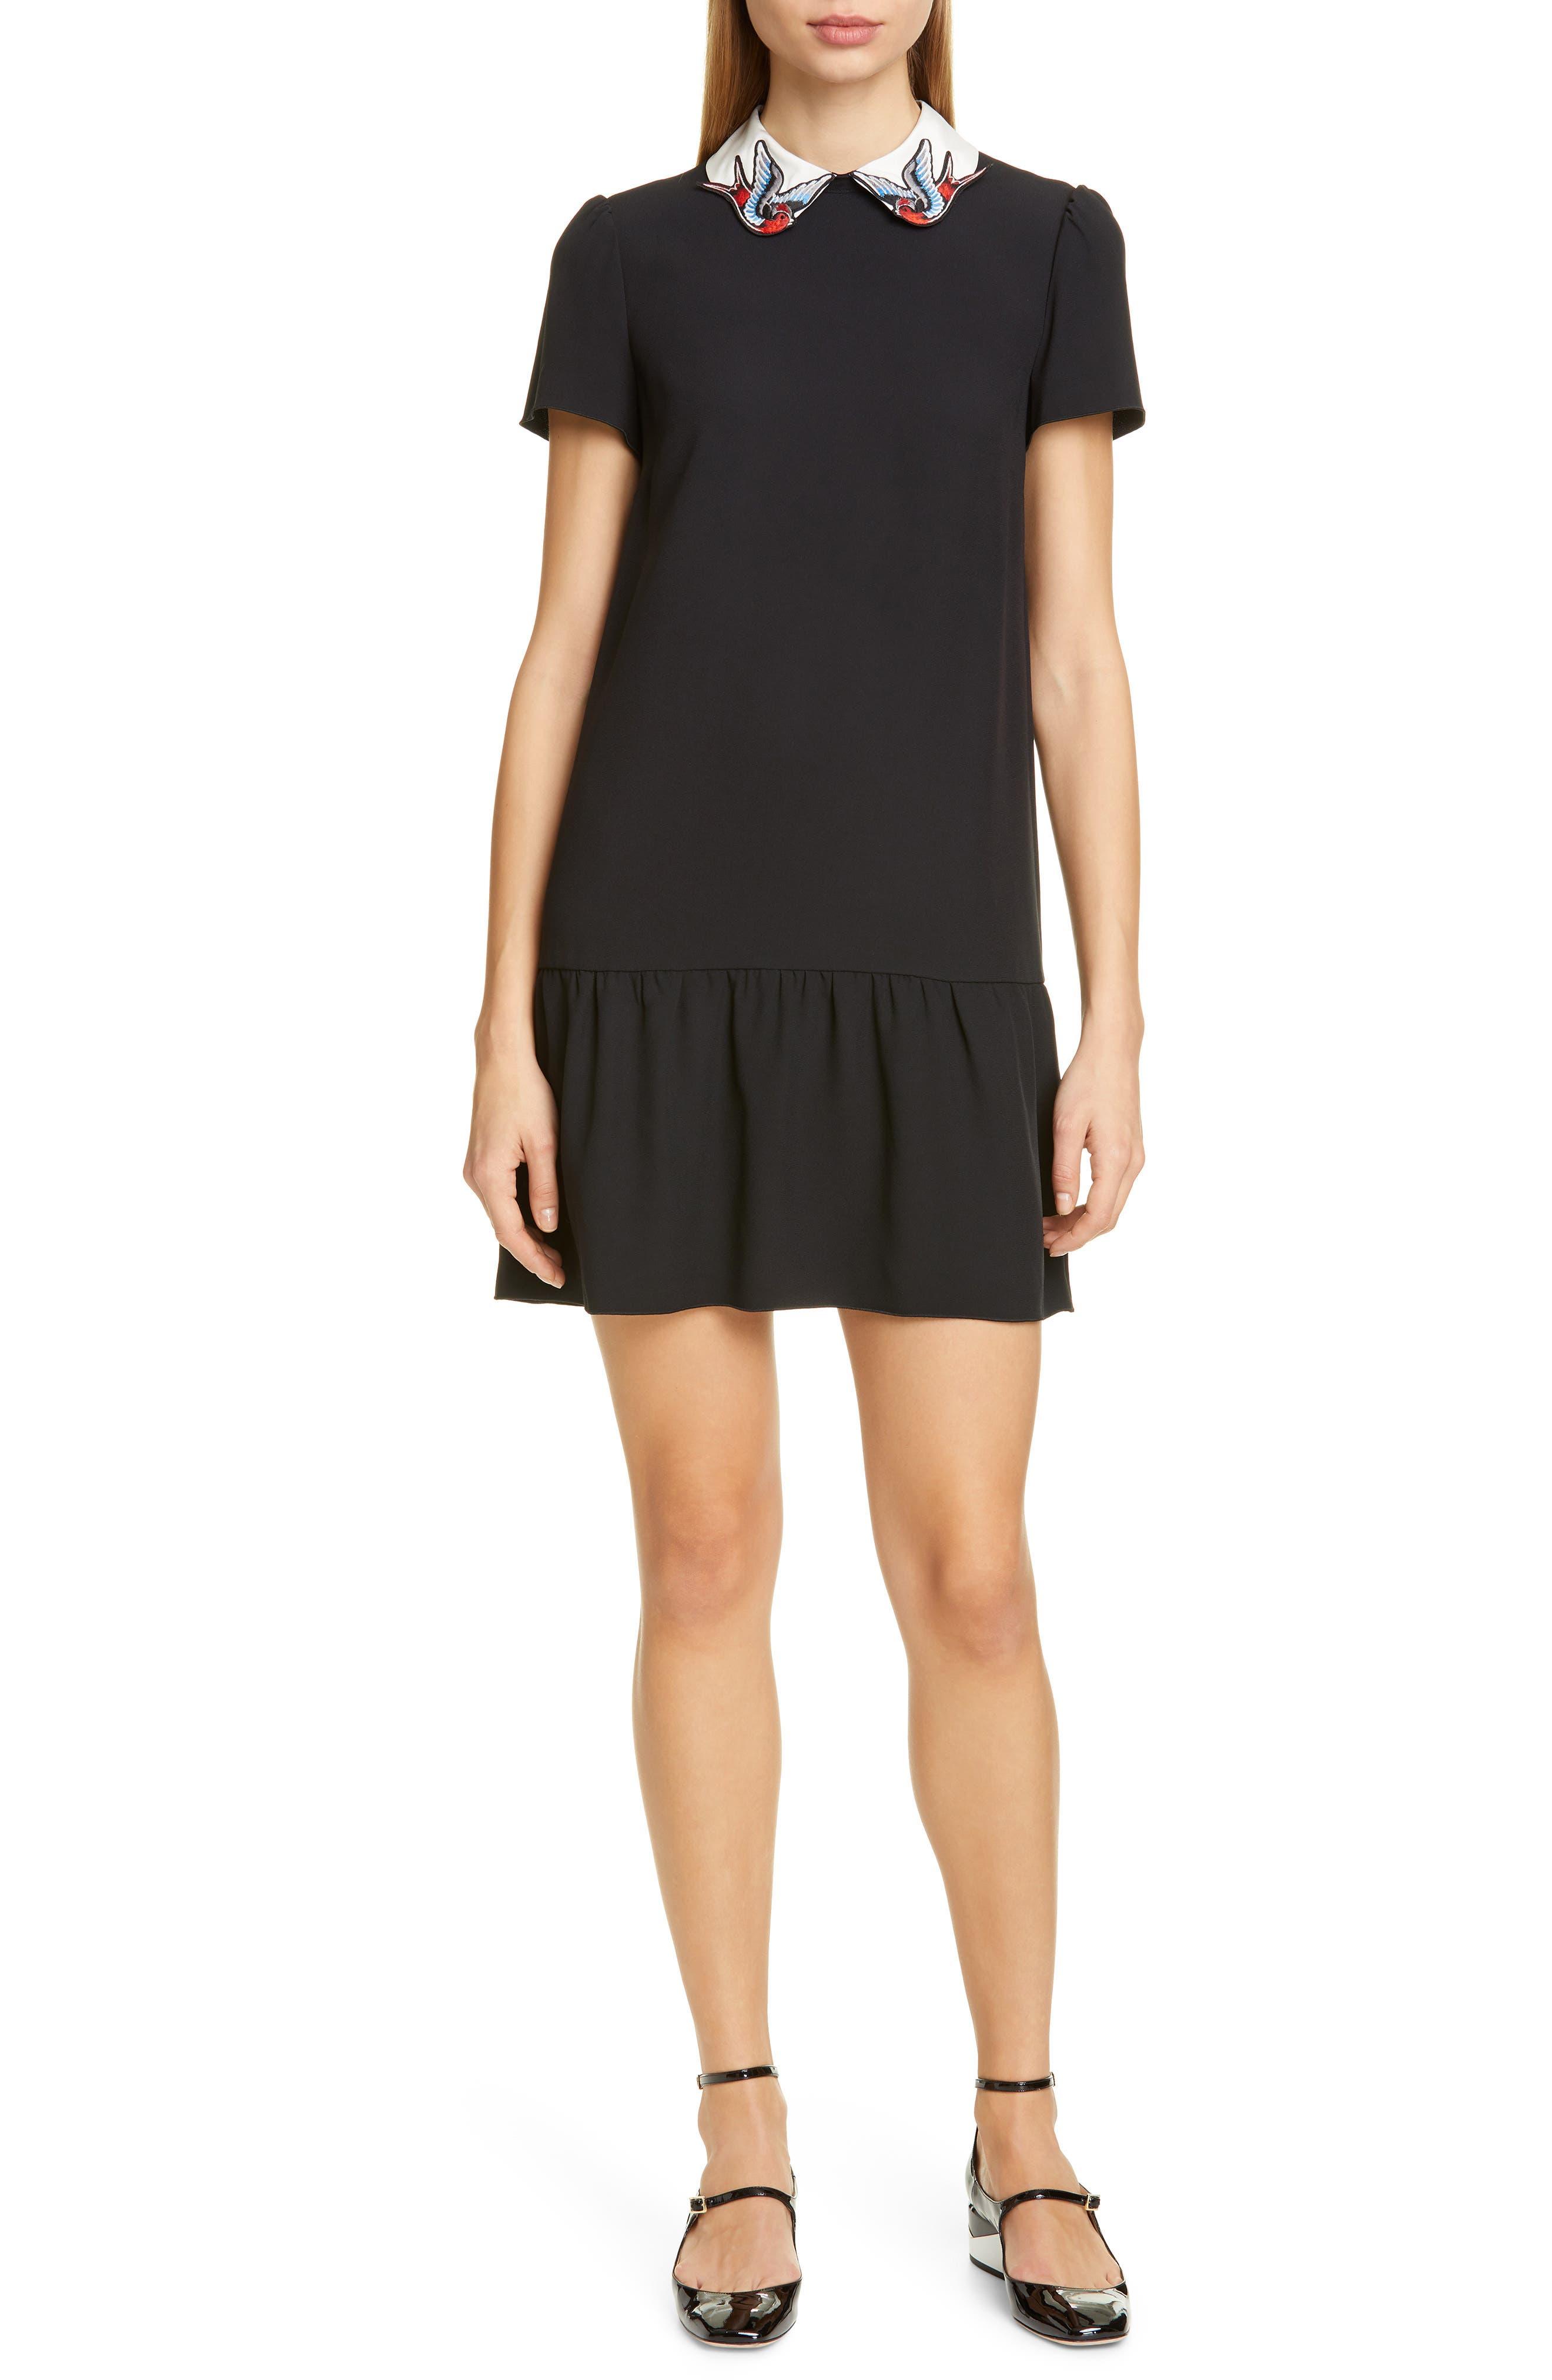 Red Valentino Swallow Collar Ruffle Hem Dress, 8 IT - Black